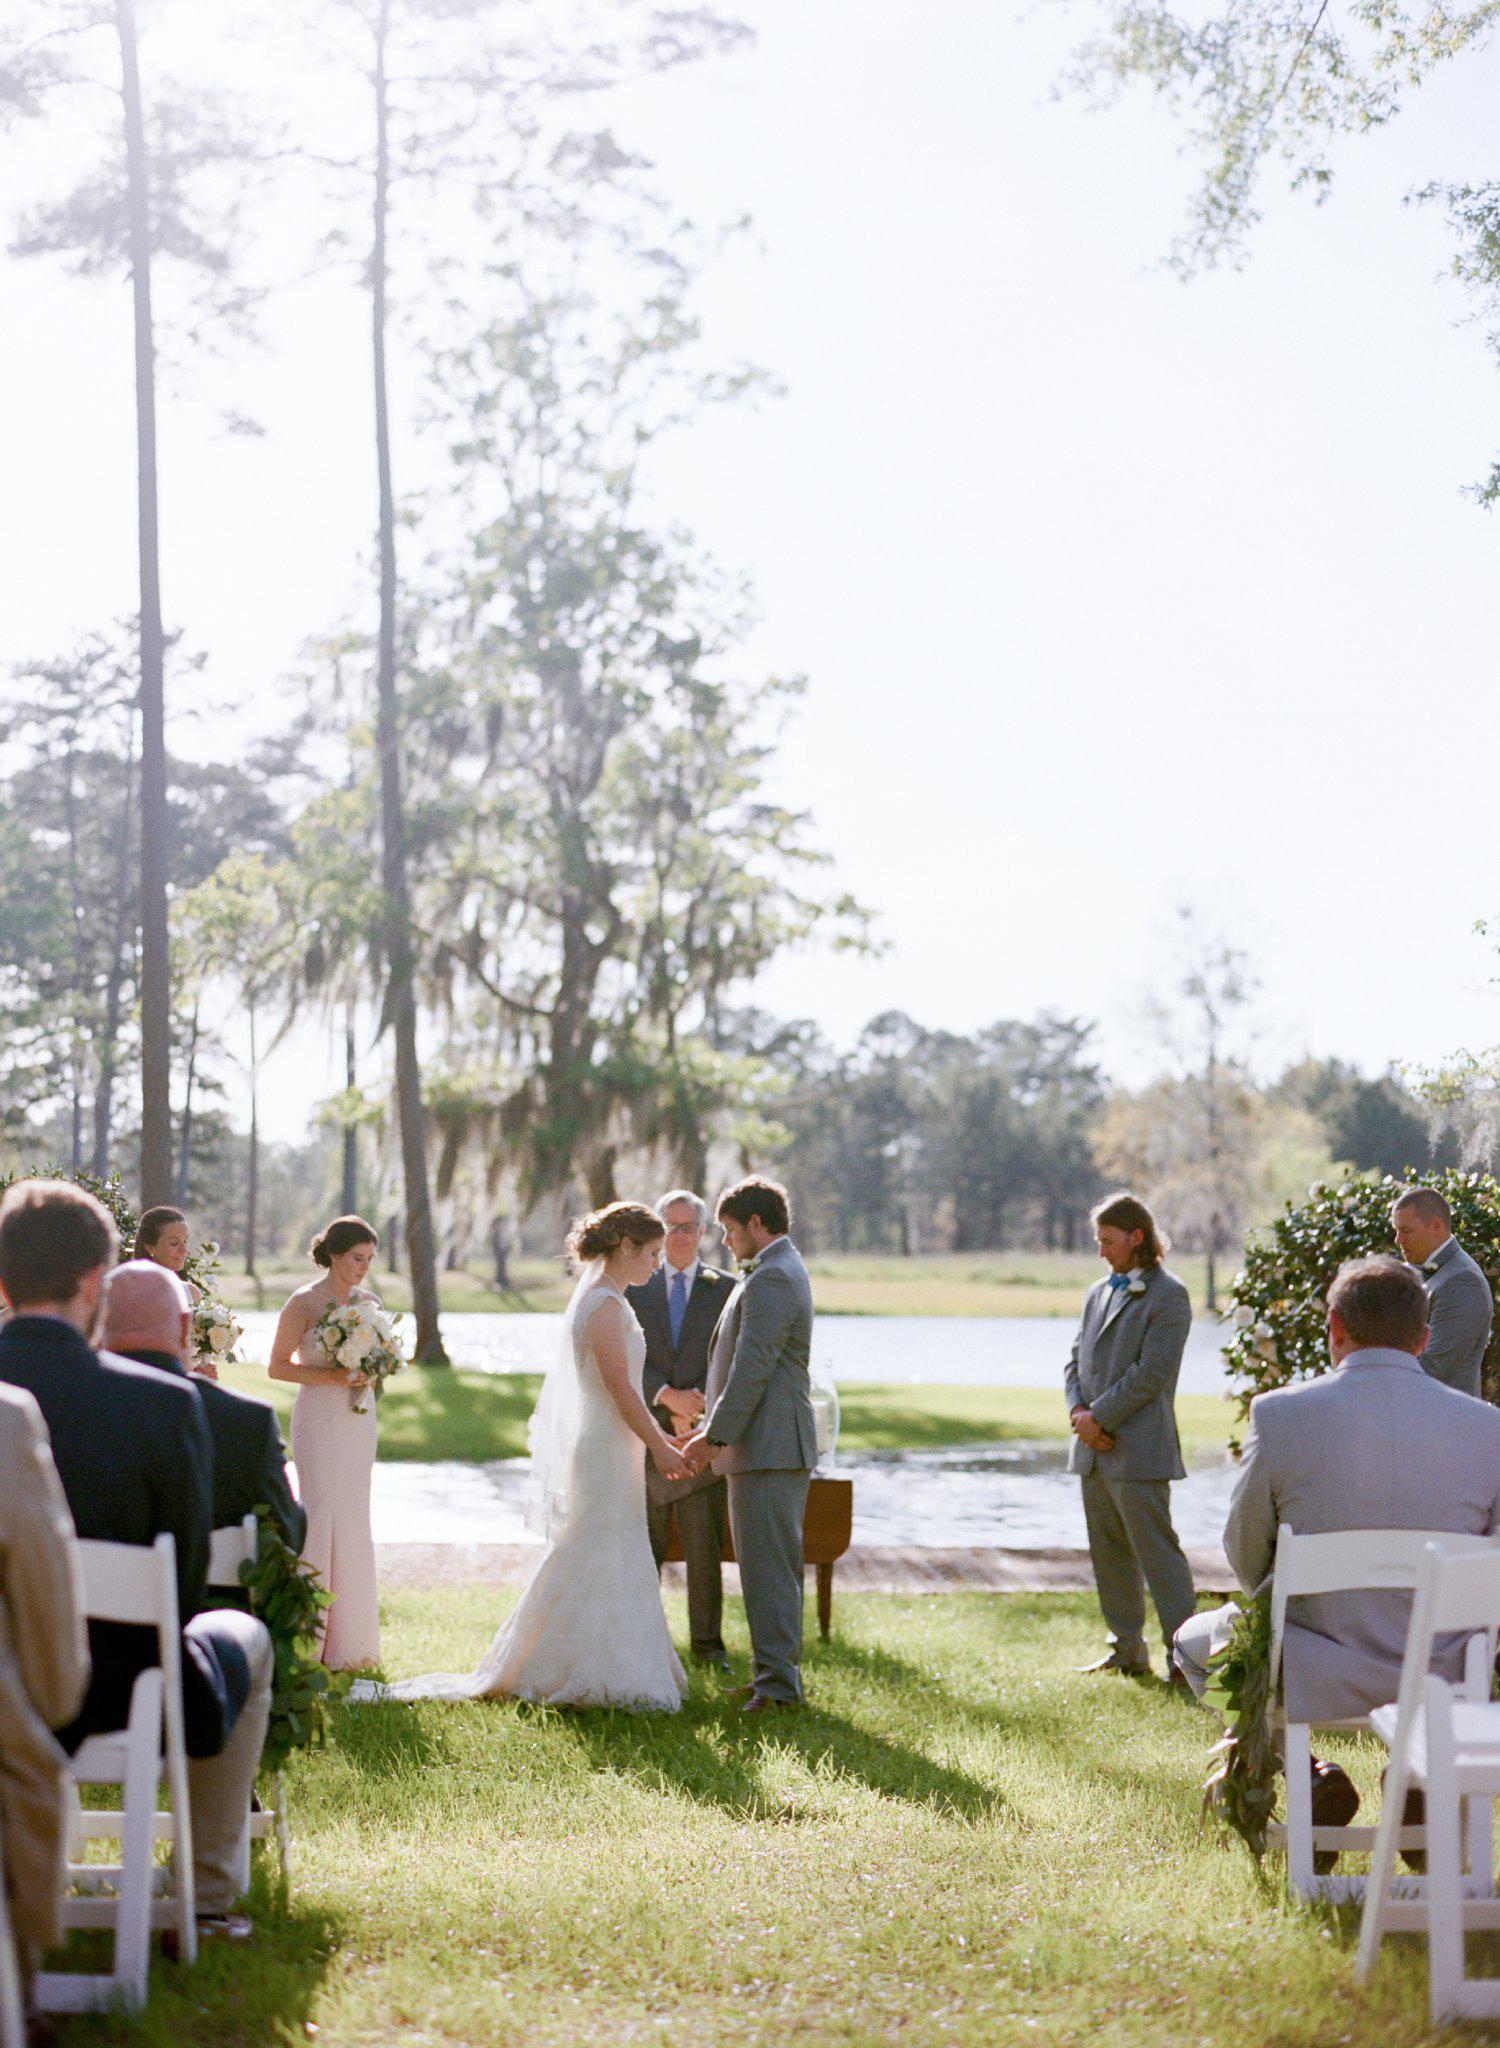 ecila farm wedding albany georgia wedding photographer shannon griffin photography-73.jpg